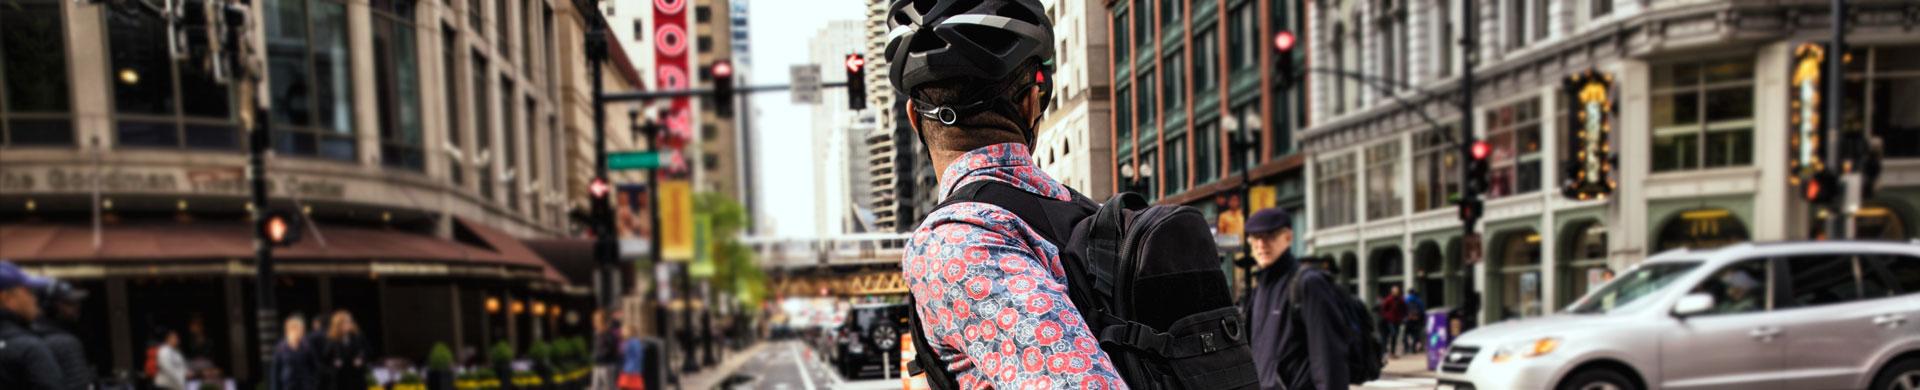 Downtown Denver Elevation Cycles Bike Shop